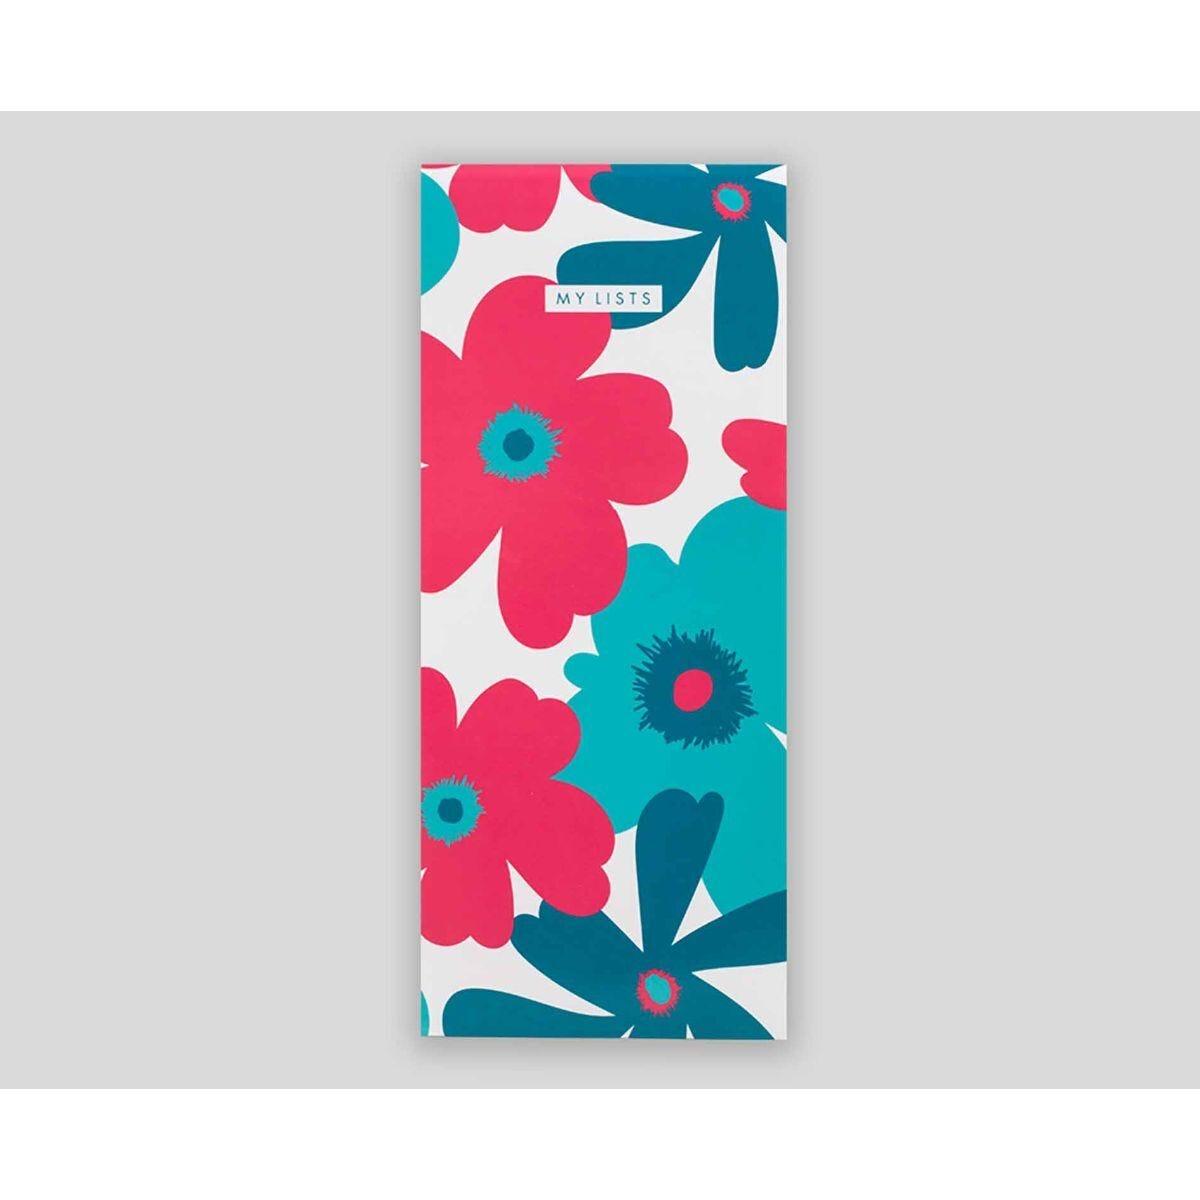 Matilda Myres Floral List Pad Slim Lined 200 Pages Blue